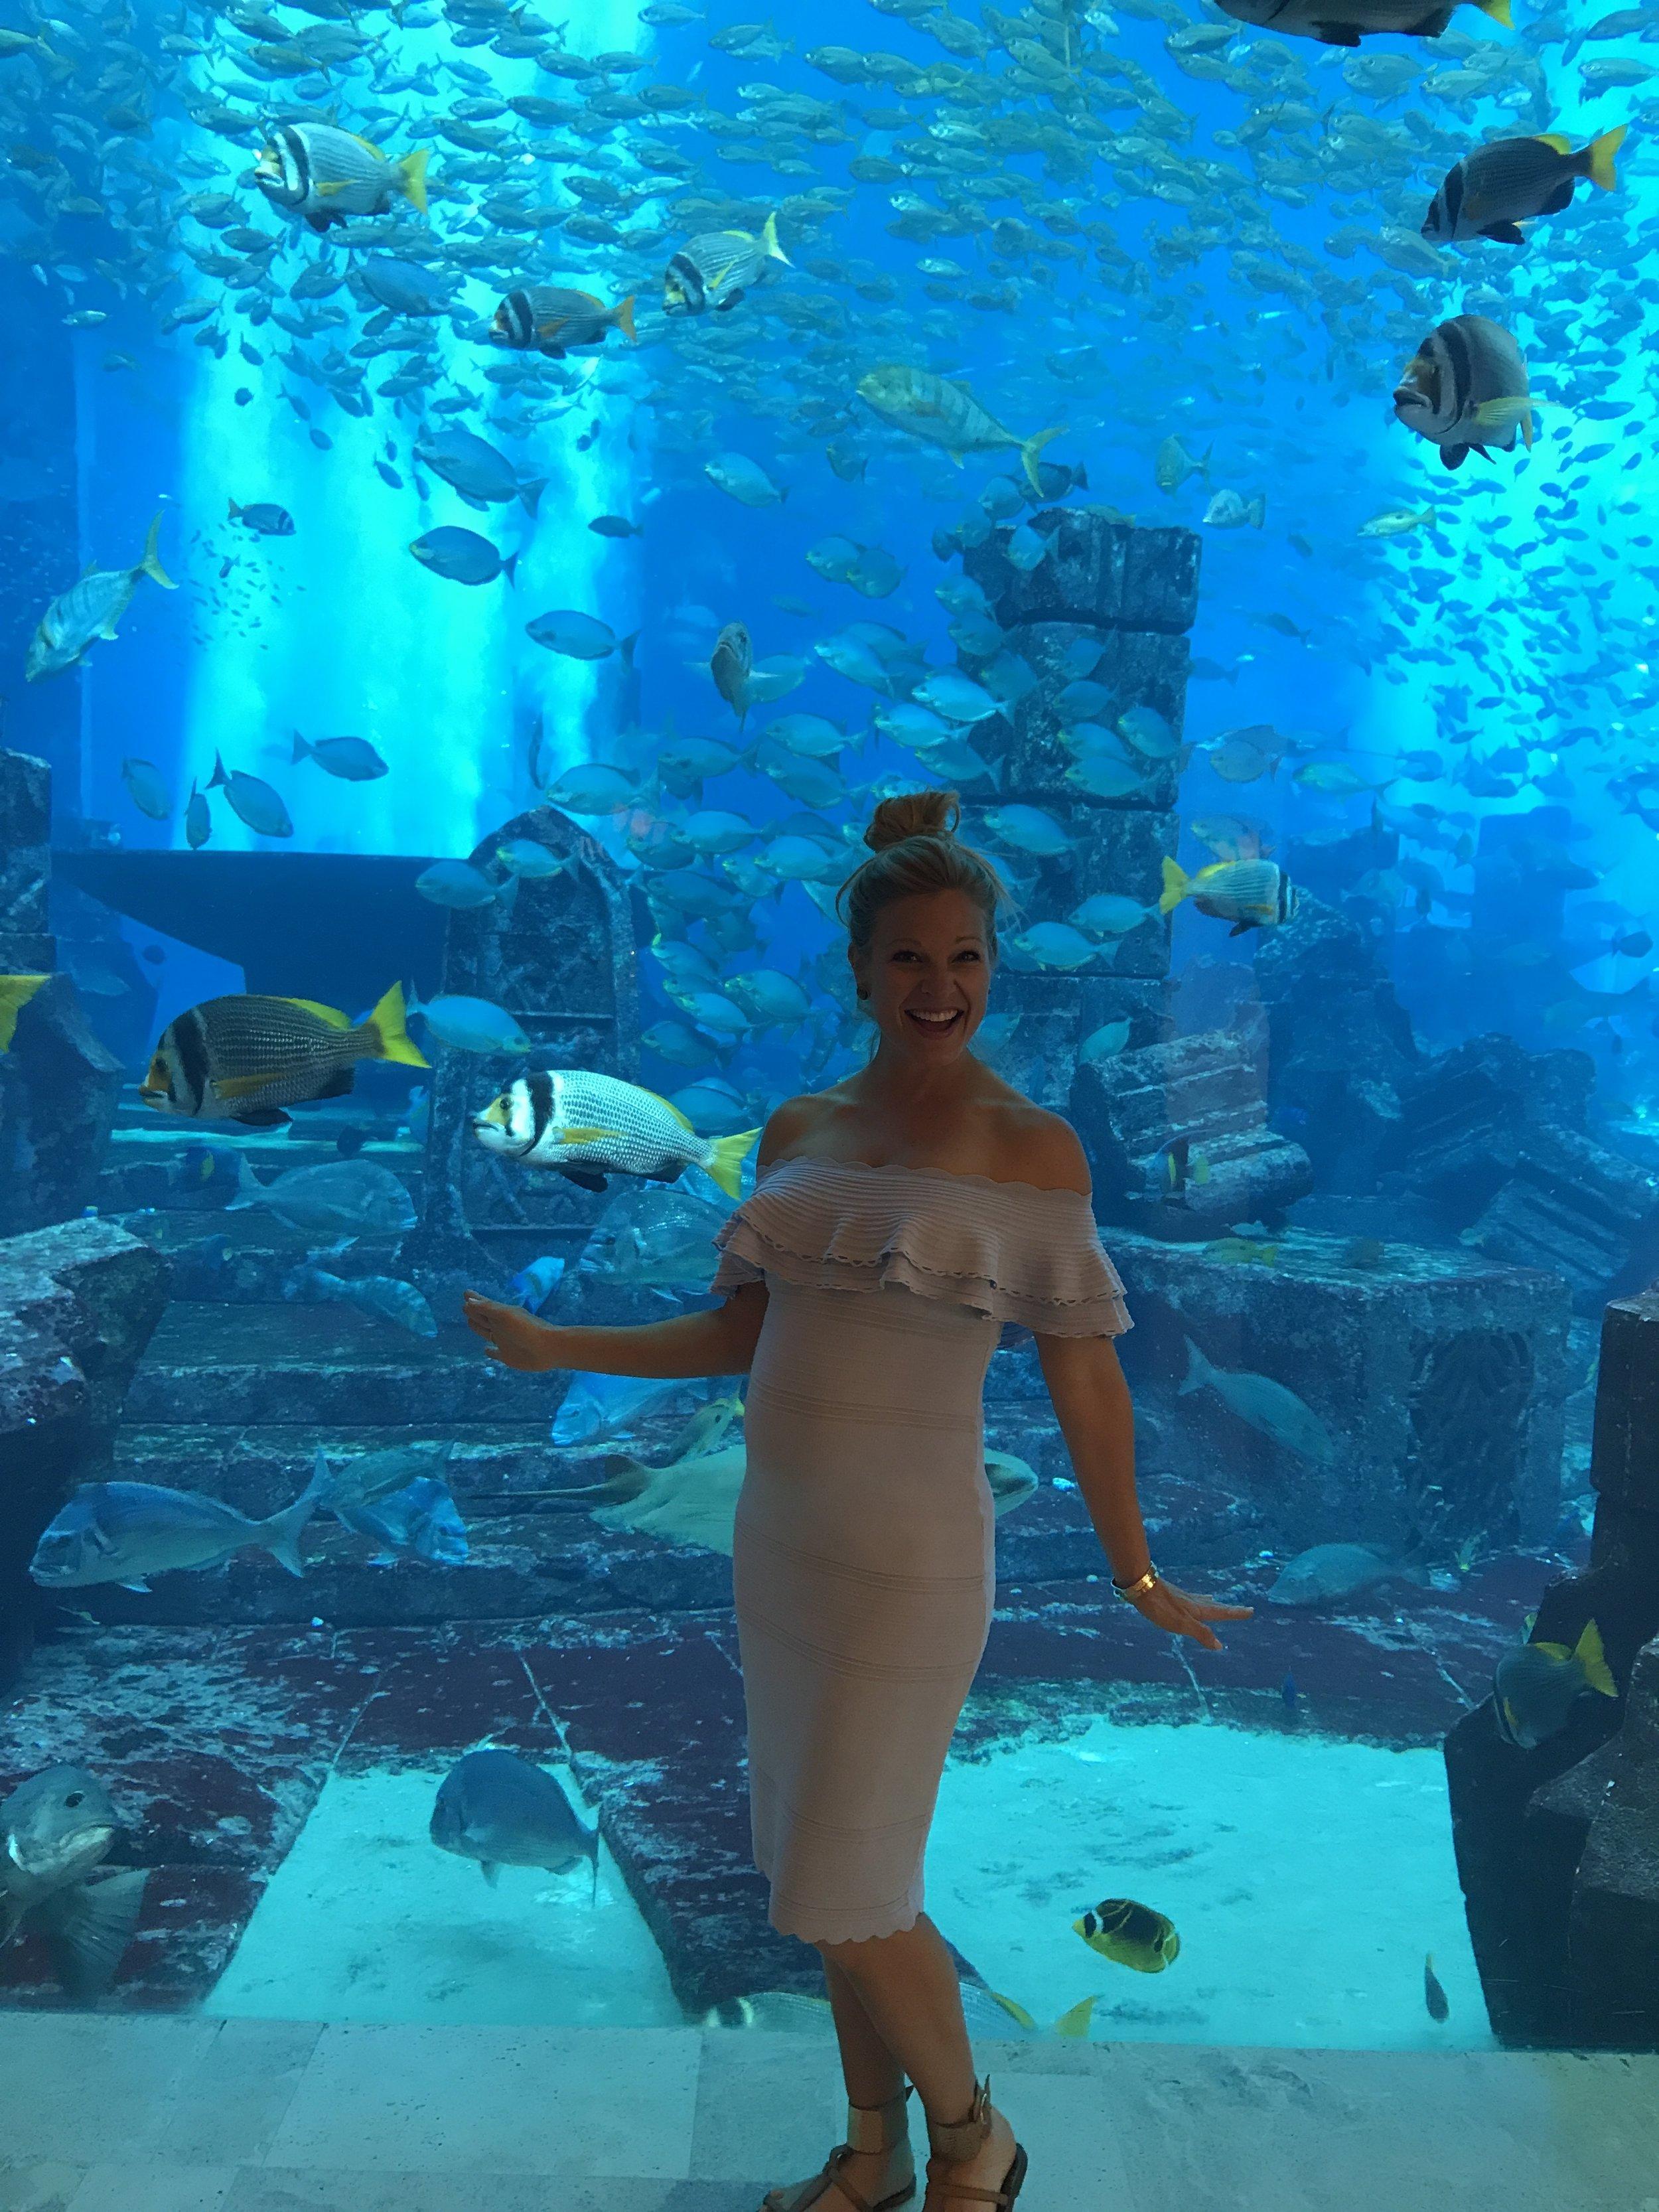 Anna Kooiman dubai arabian adventures united arab emirates gordon ramsay aquarium waterslide desert fitness travel lifestyle fashion adventure style